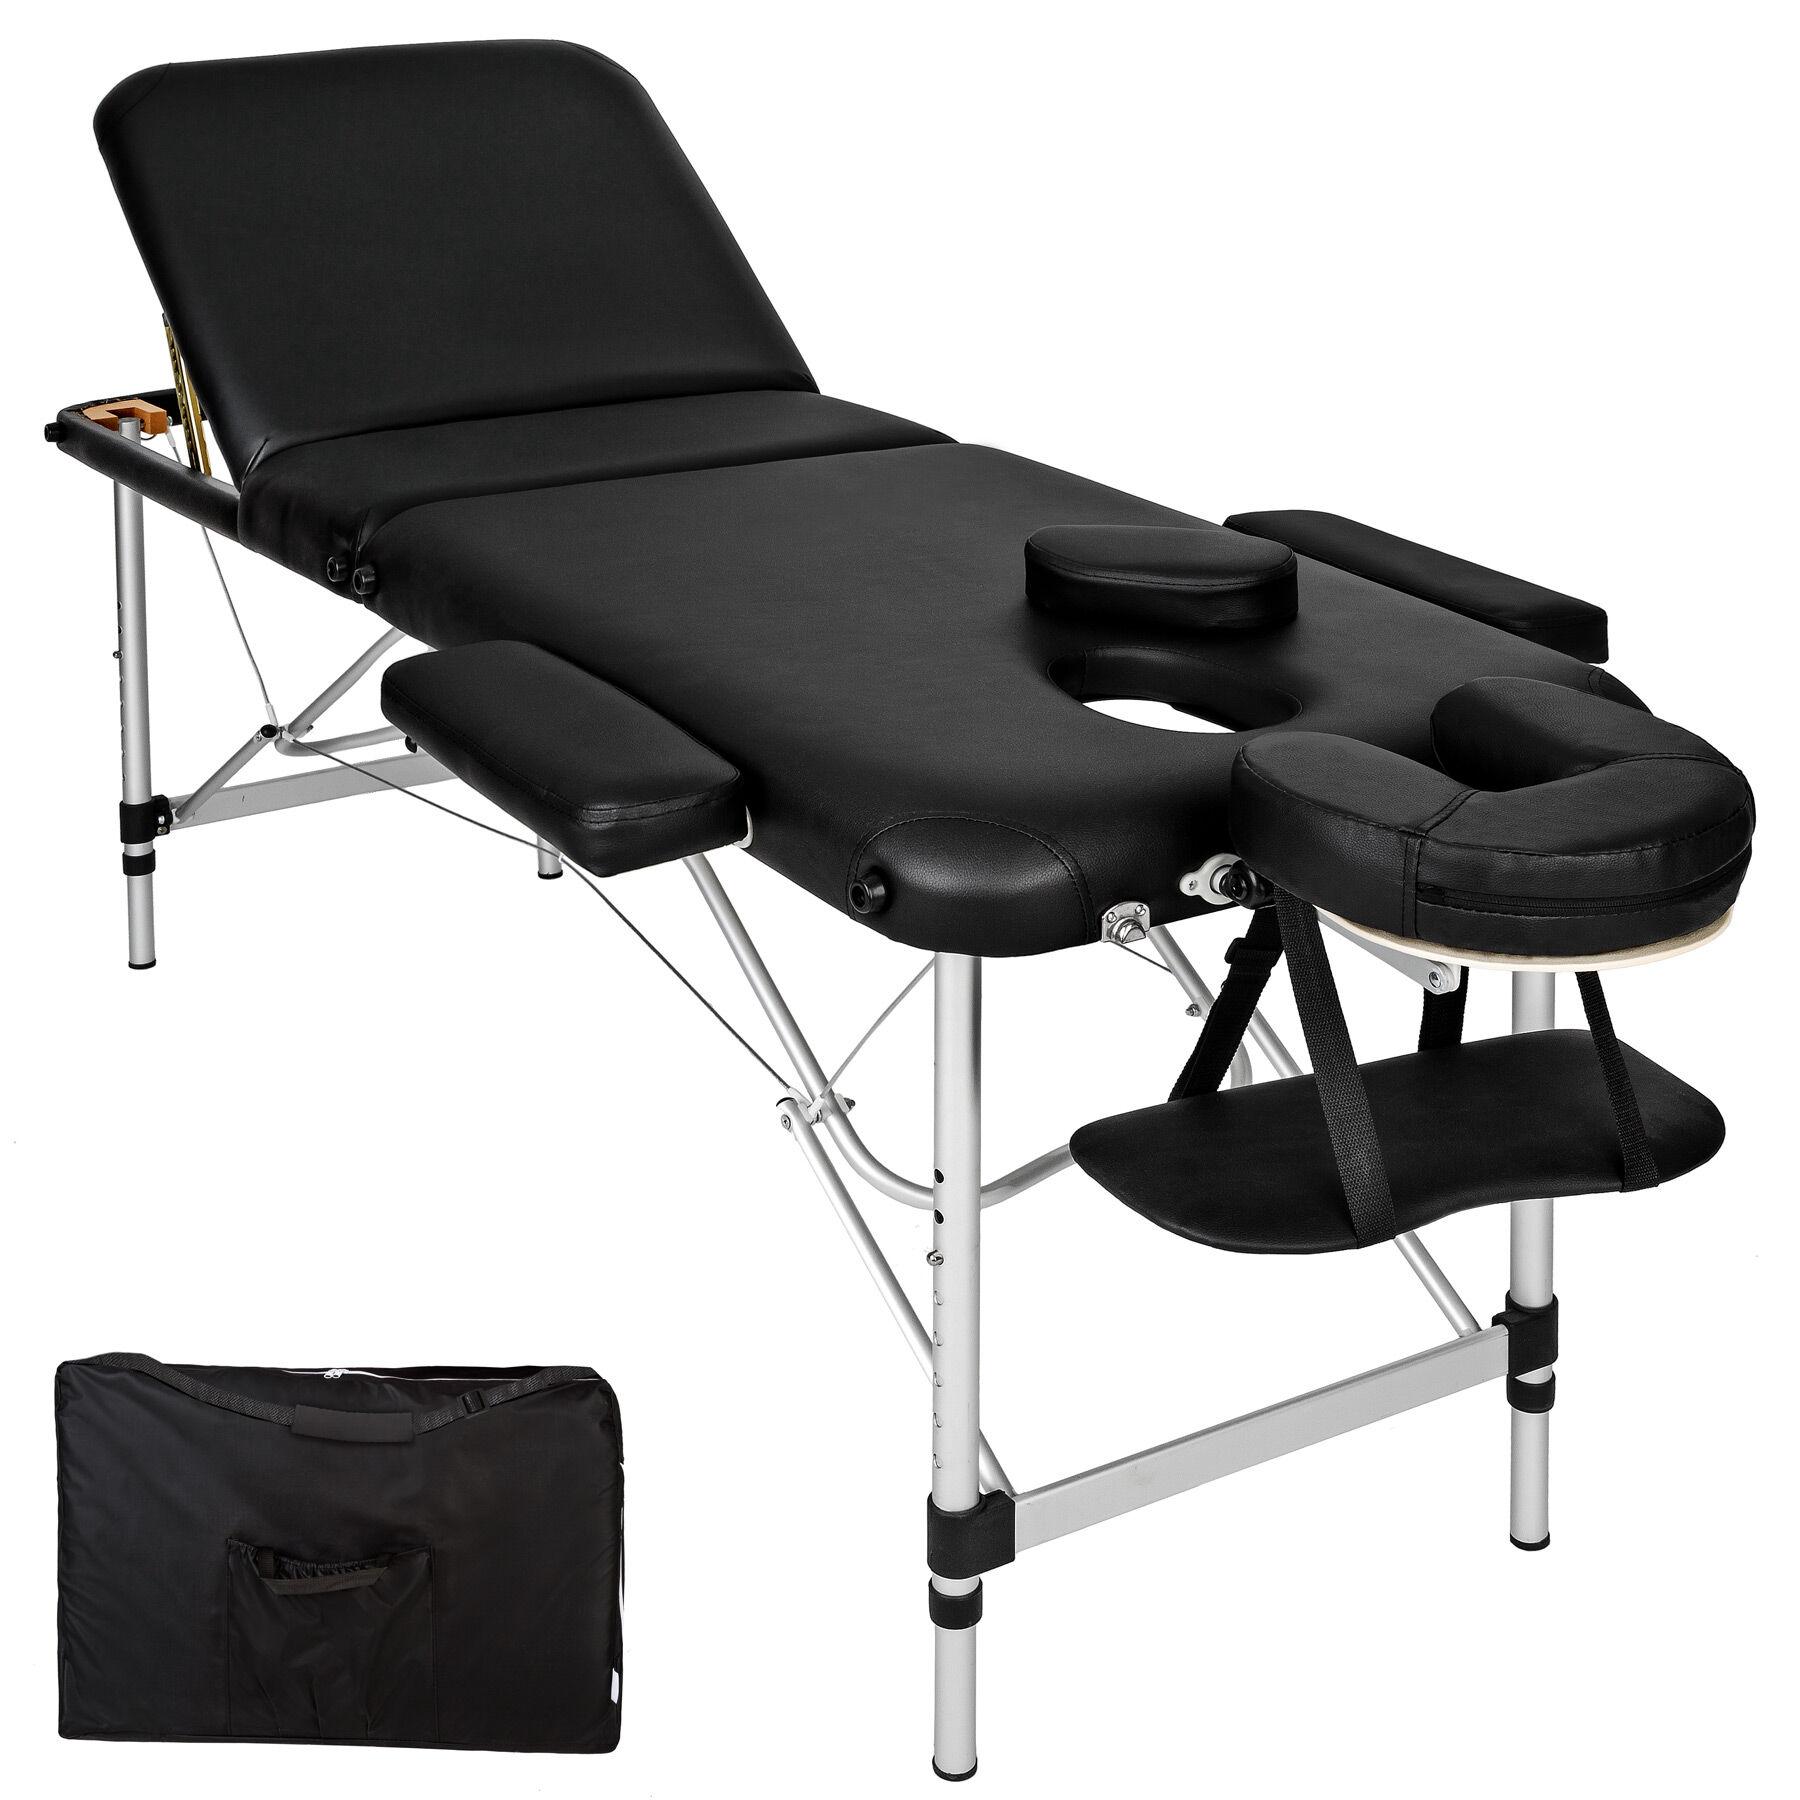 tectake Massage table 3-zone aluminium 5 cm padding + bag - black